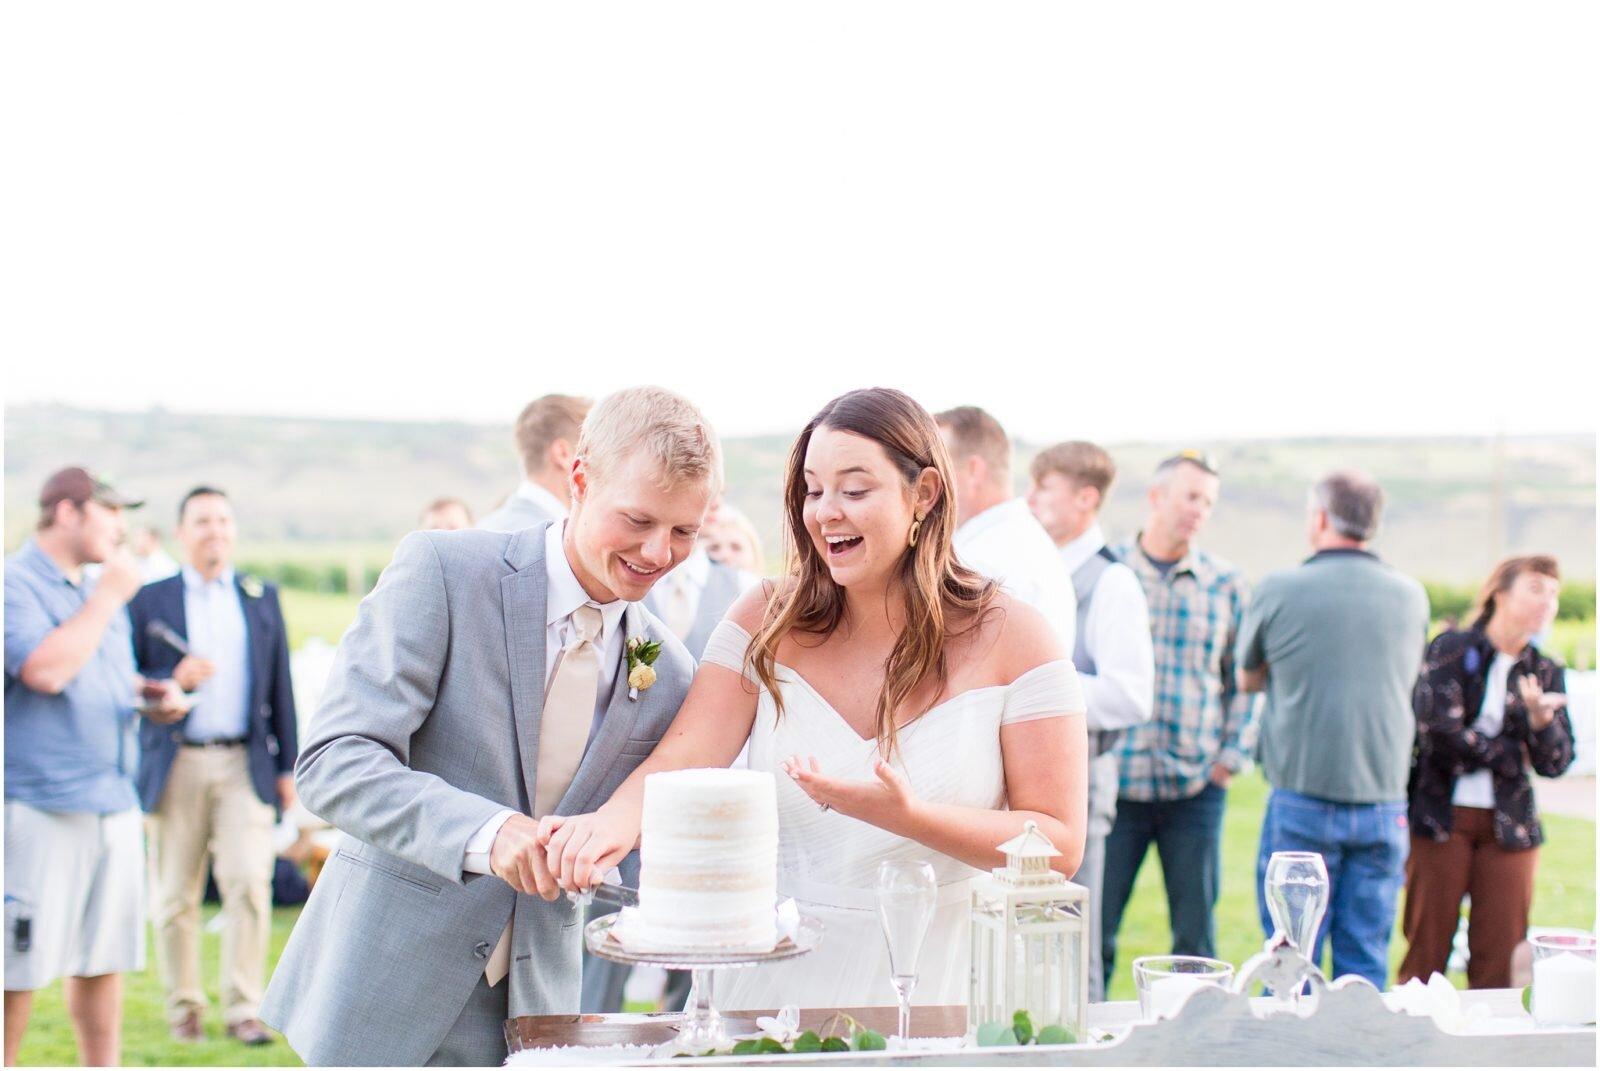 Fontaine-Estates-Winery-Wedding-Spokane-Wedding-Photographer-Taylor-Rose-Photography_0082-1600x1071.jpg